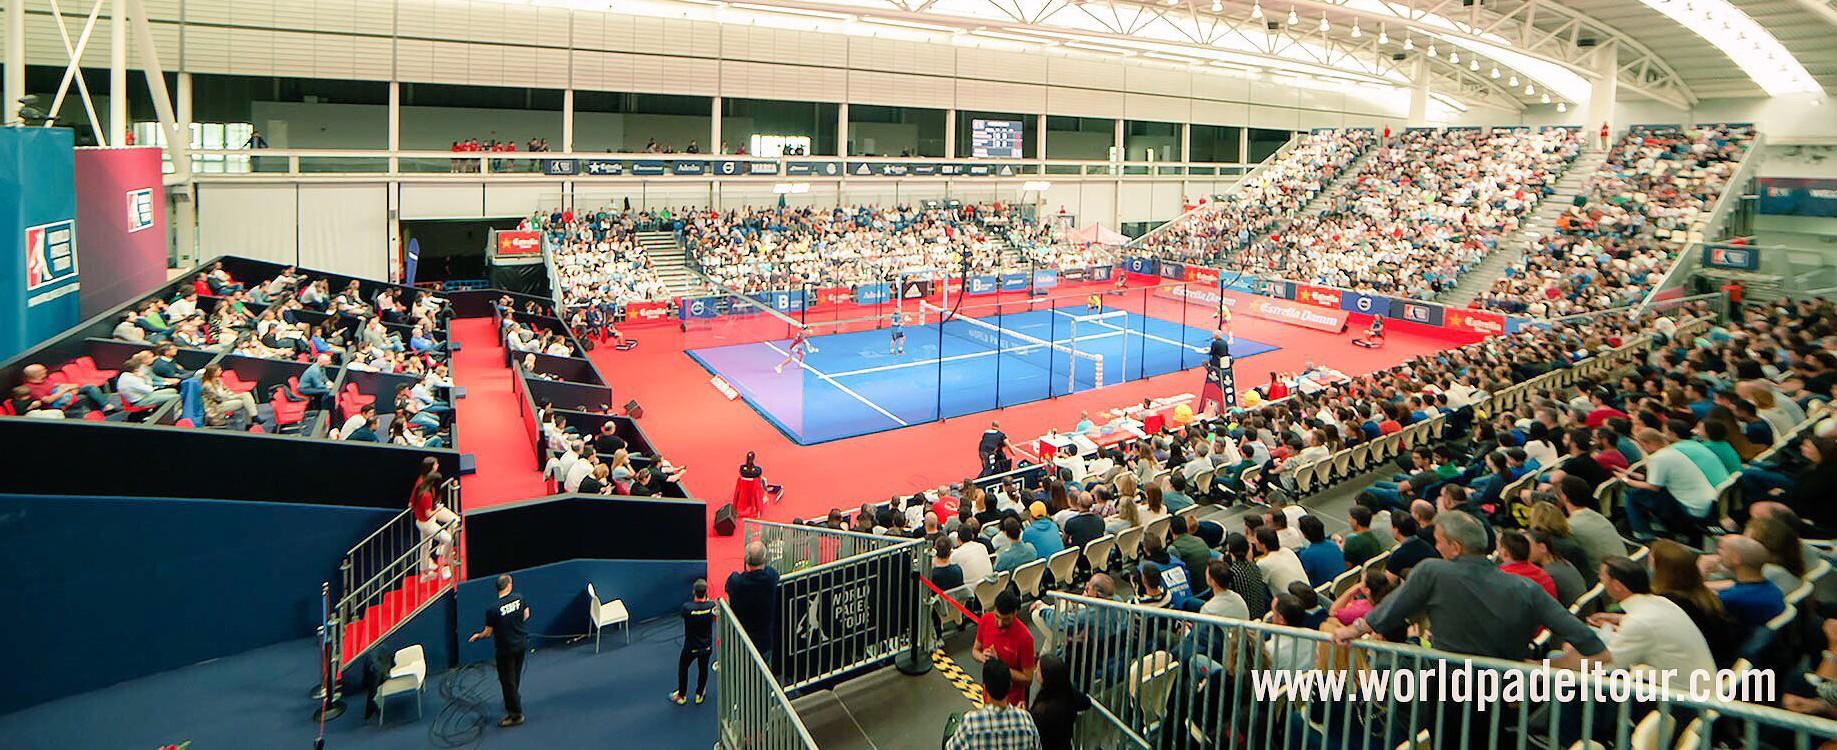 Pista central del Open de A Coruña del WPT, equipada con STX Supercourt.